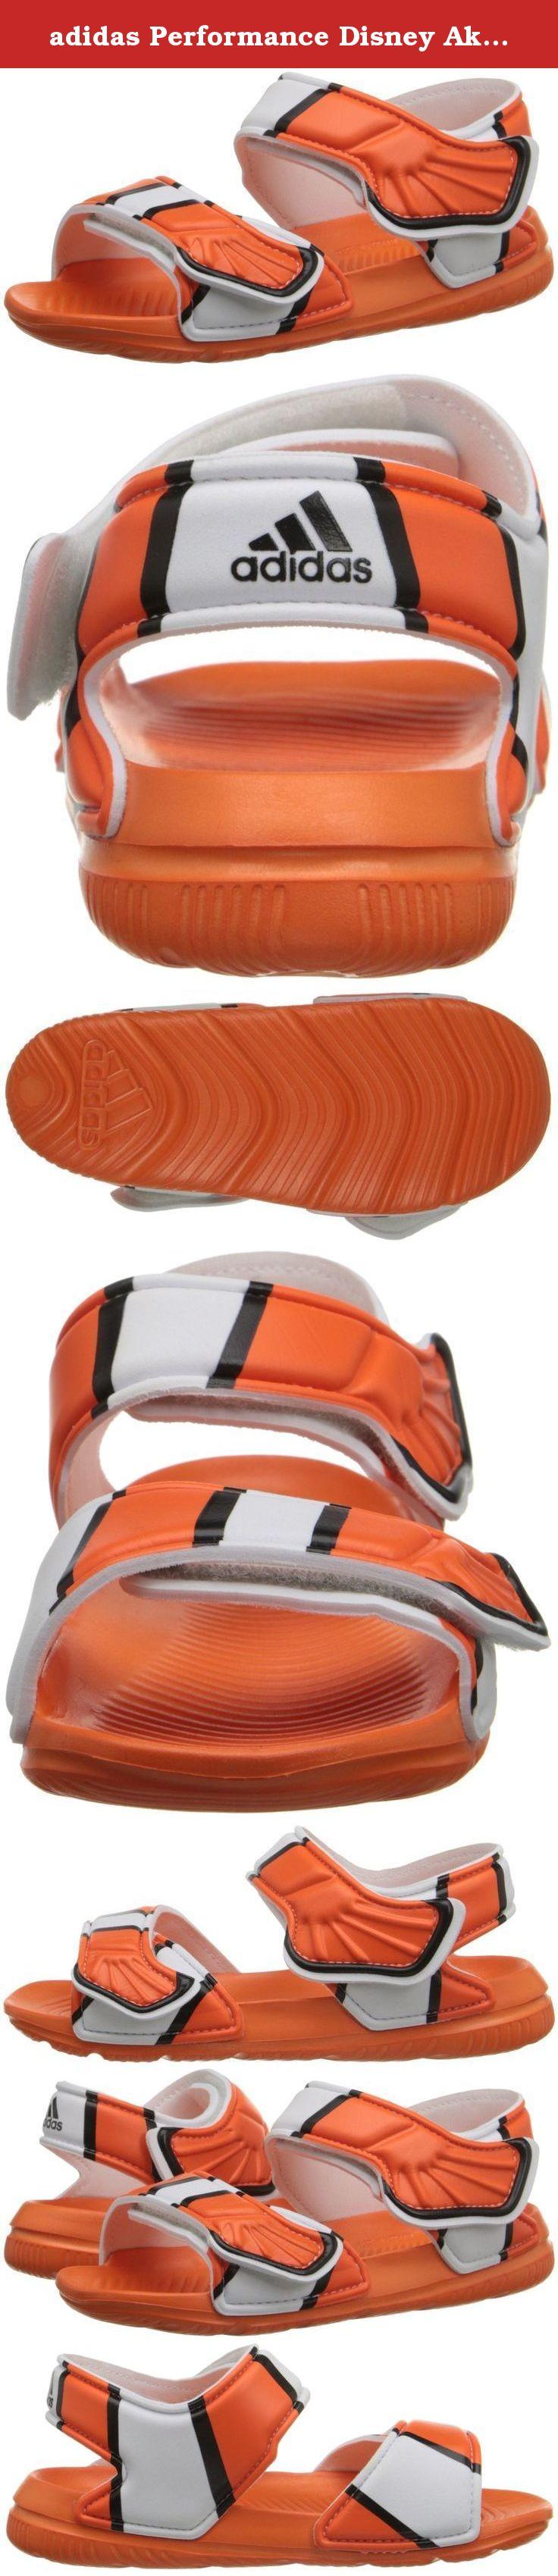 f65059603ecc adidas Performance Disney Akwah 9 I Water Shoe